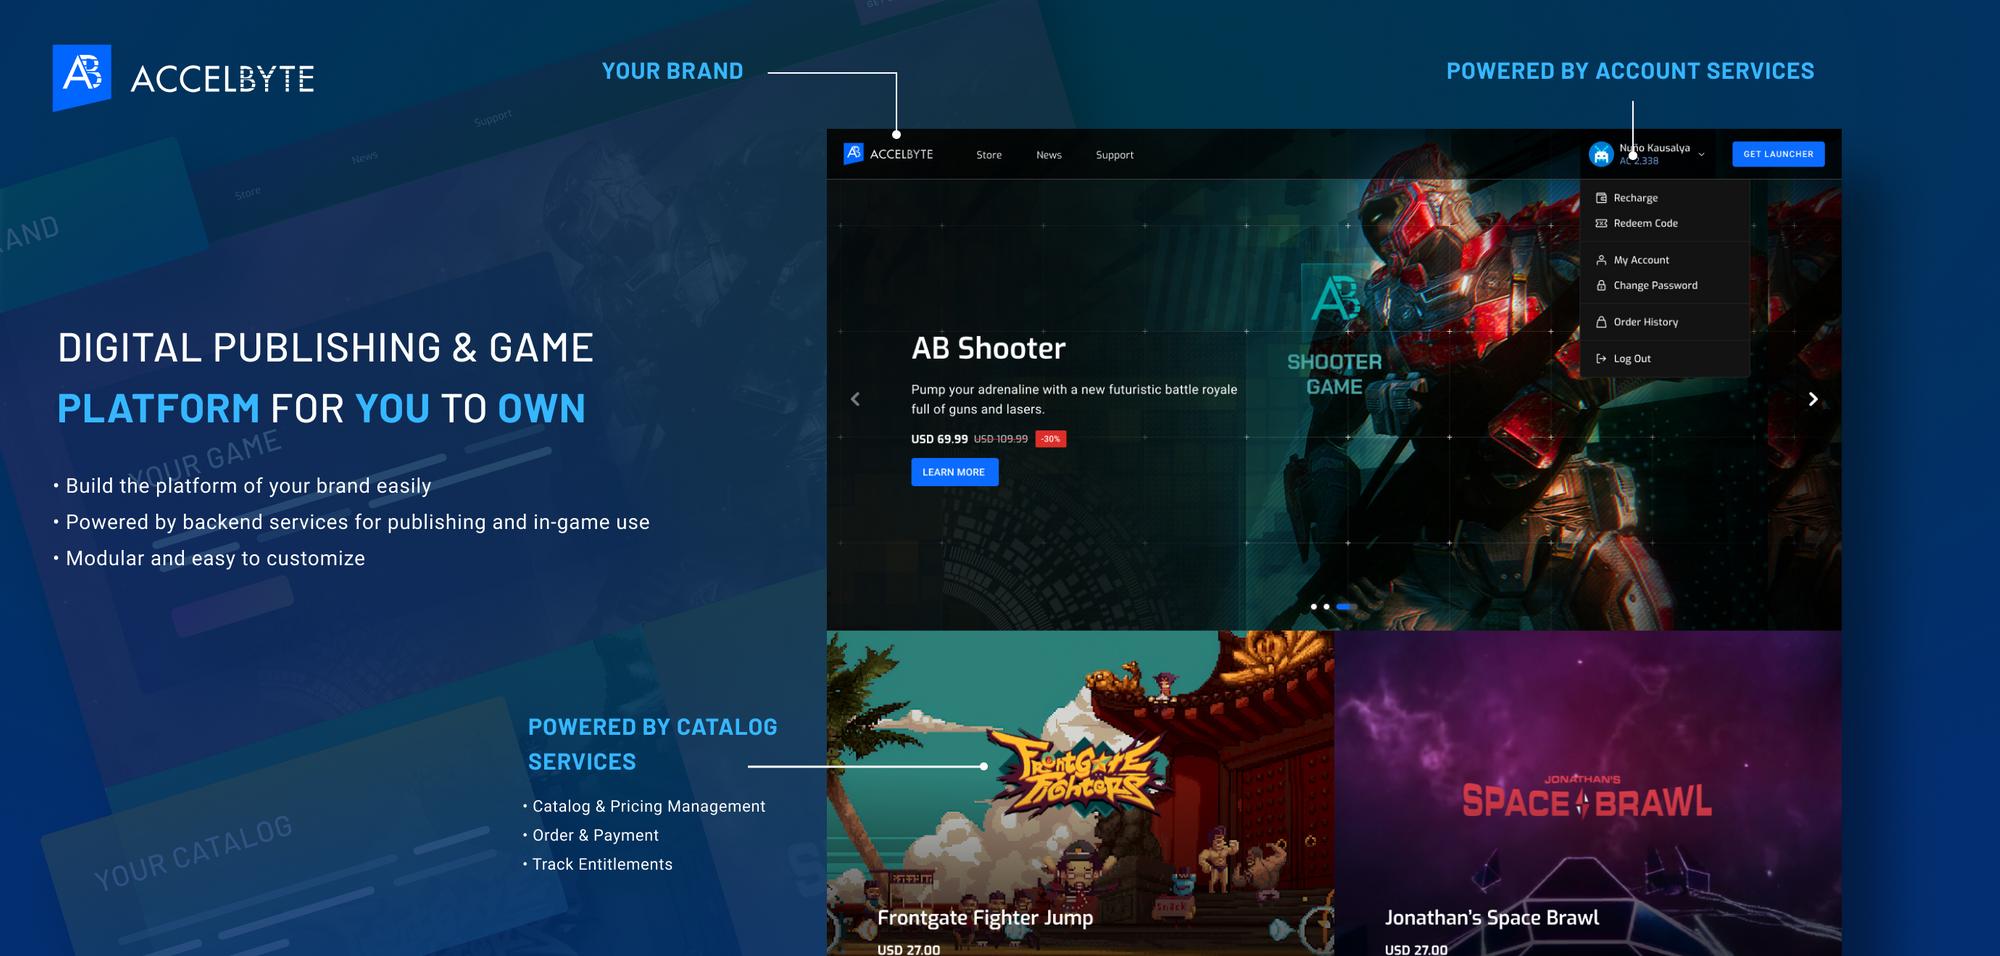 Digital Publishing & Game Platform